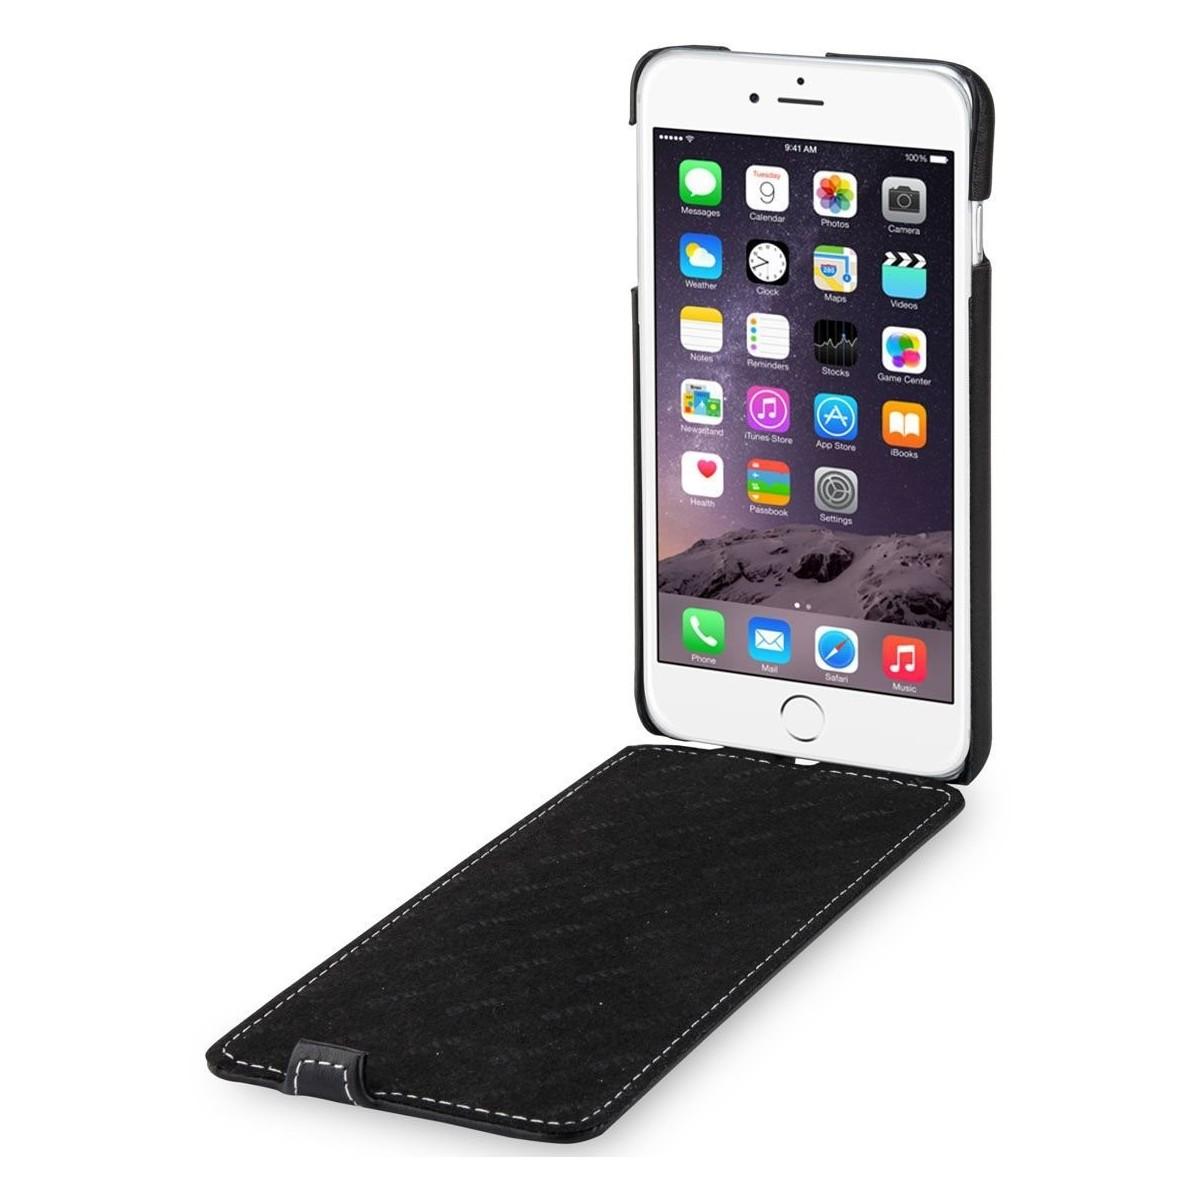 Etui iPhone 6 Plus/ 6s Plus ultraslim en cuir véritable noir nappa - Stilgut